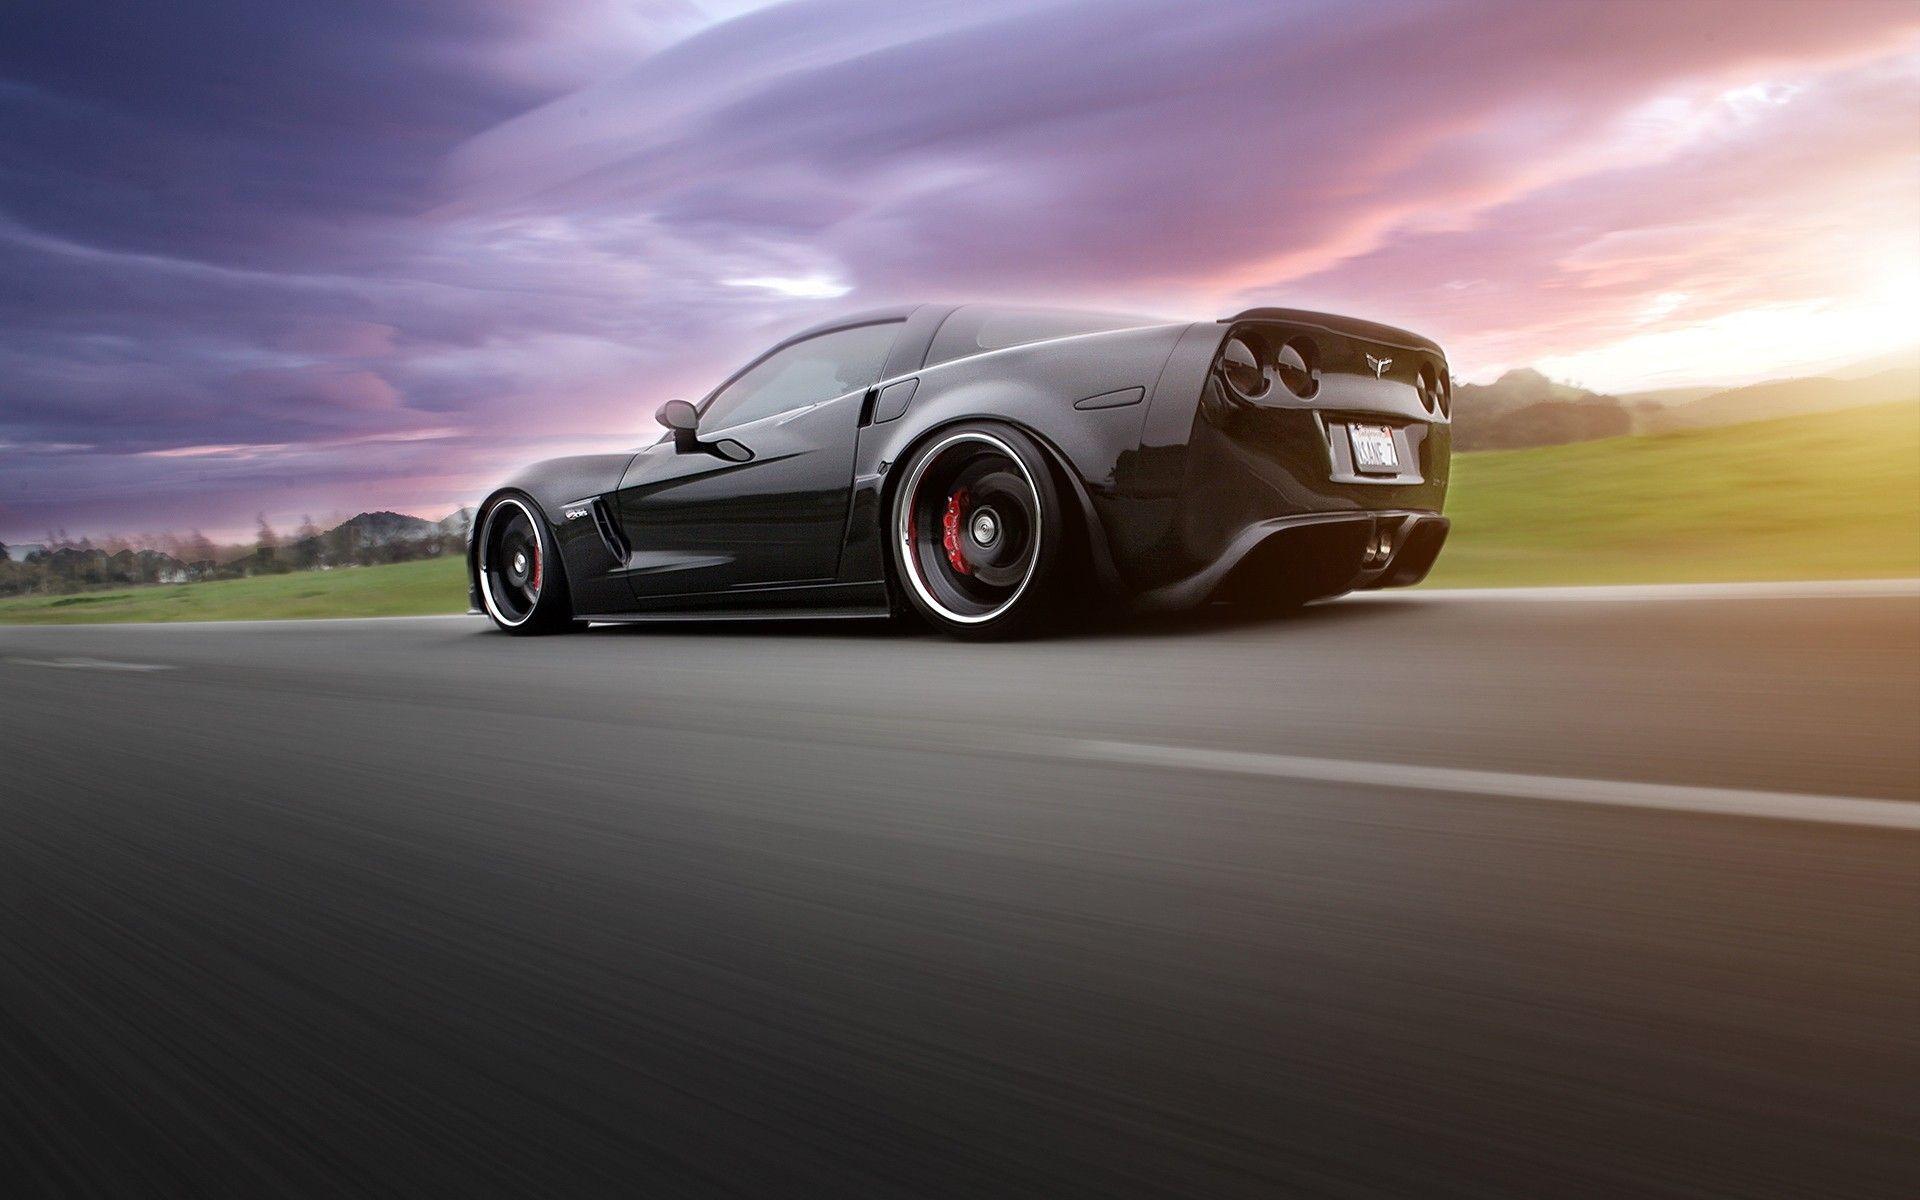 corvette backgrounds